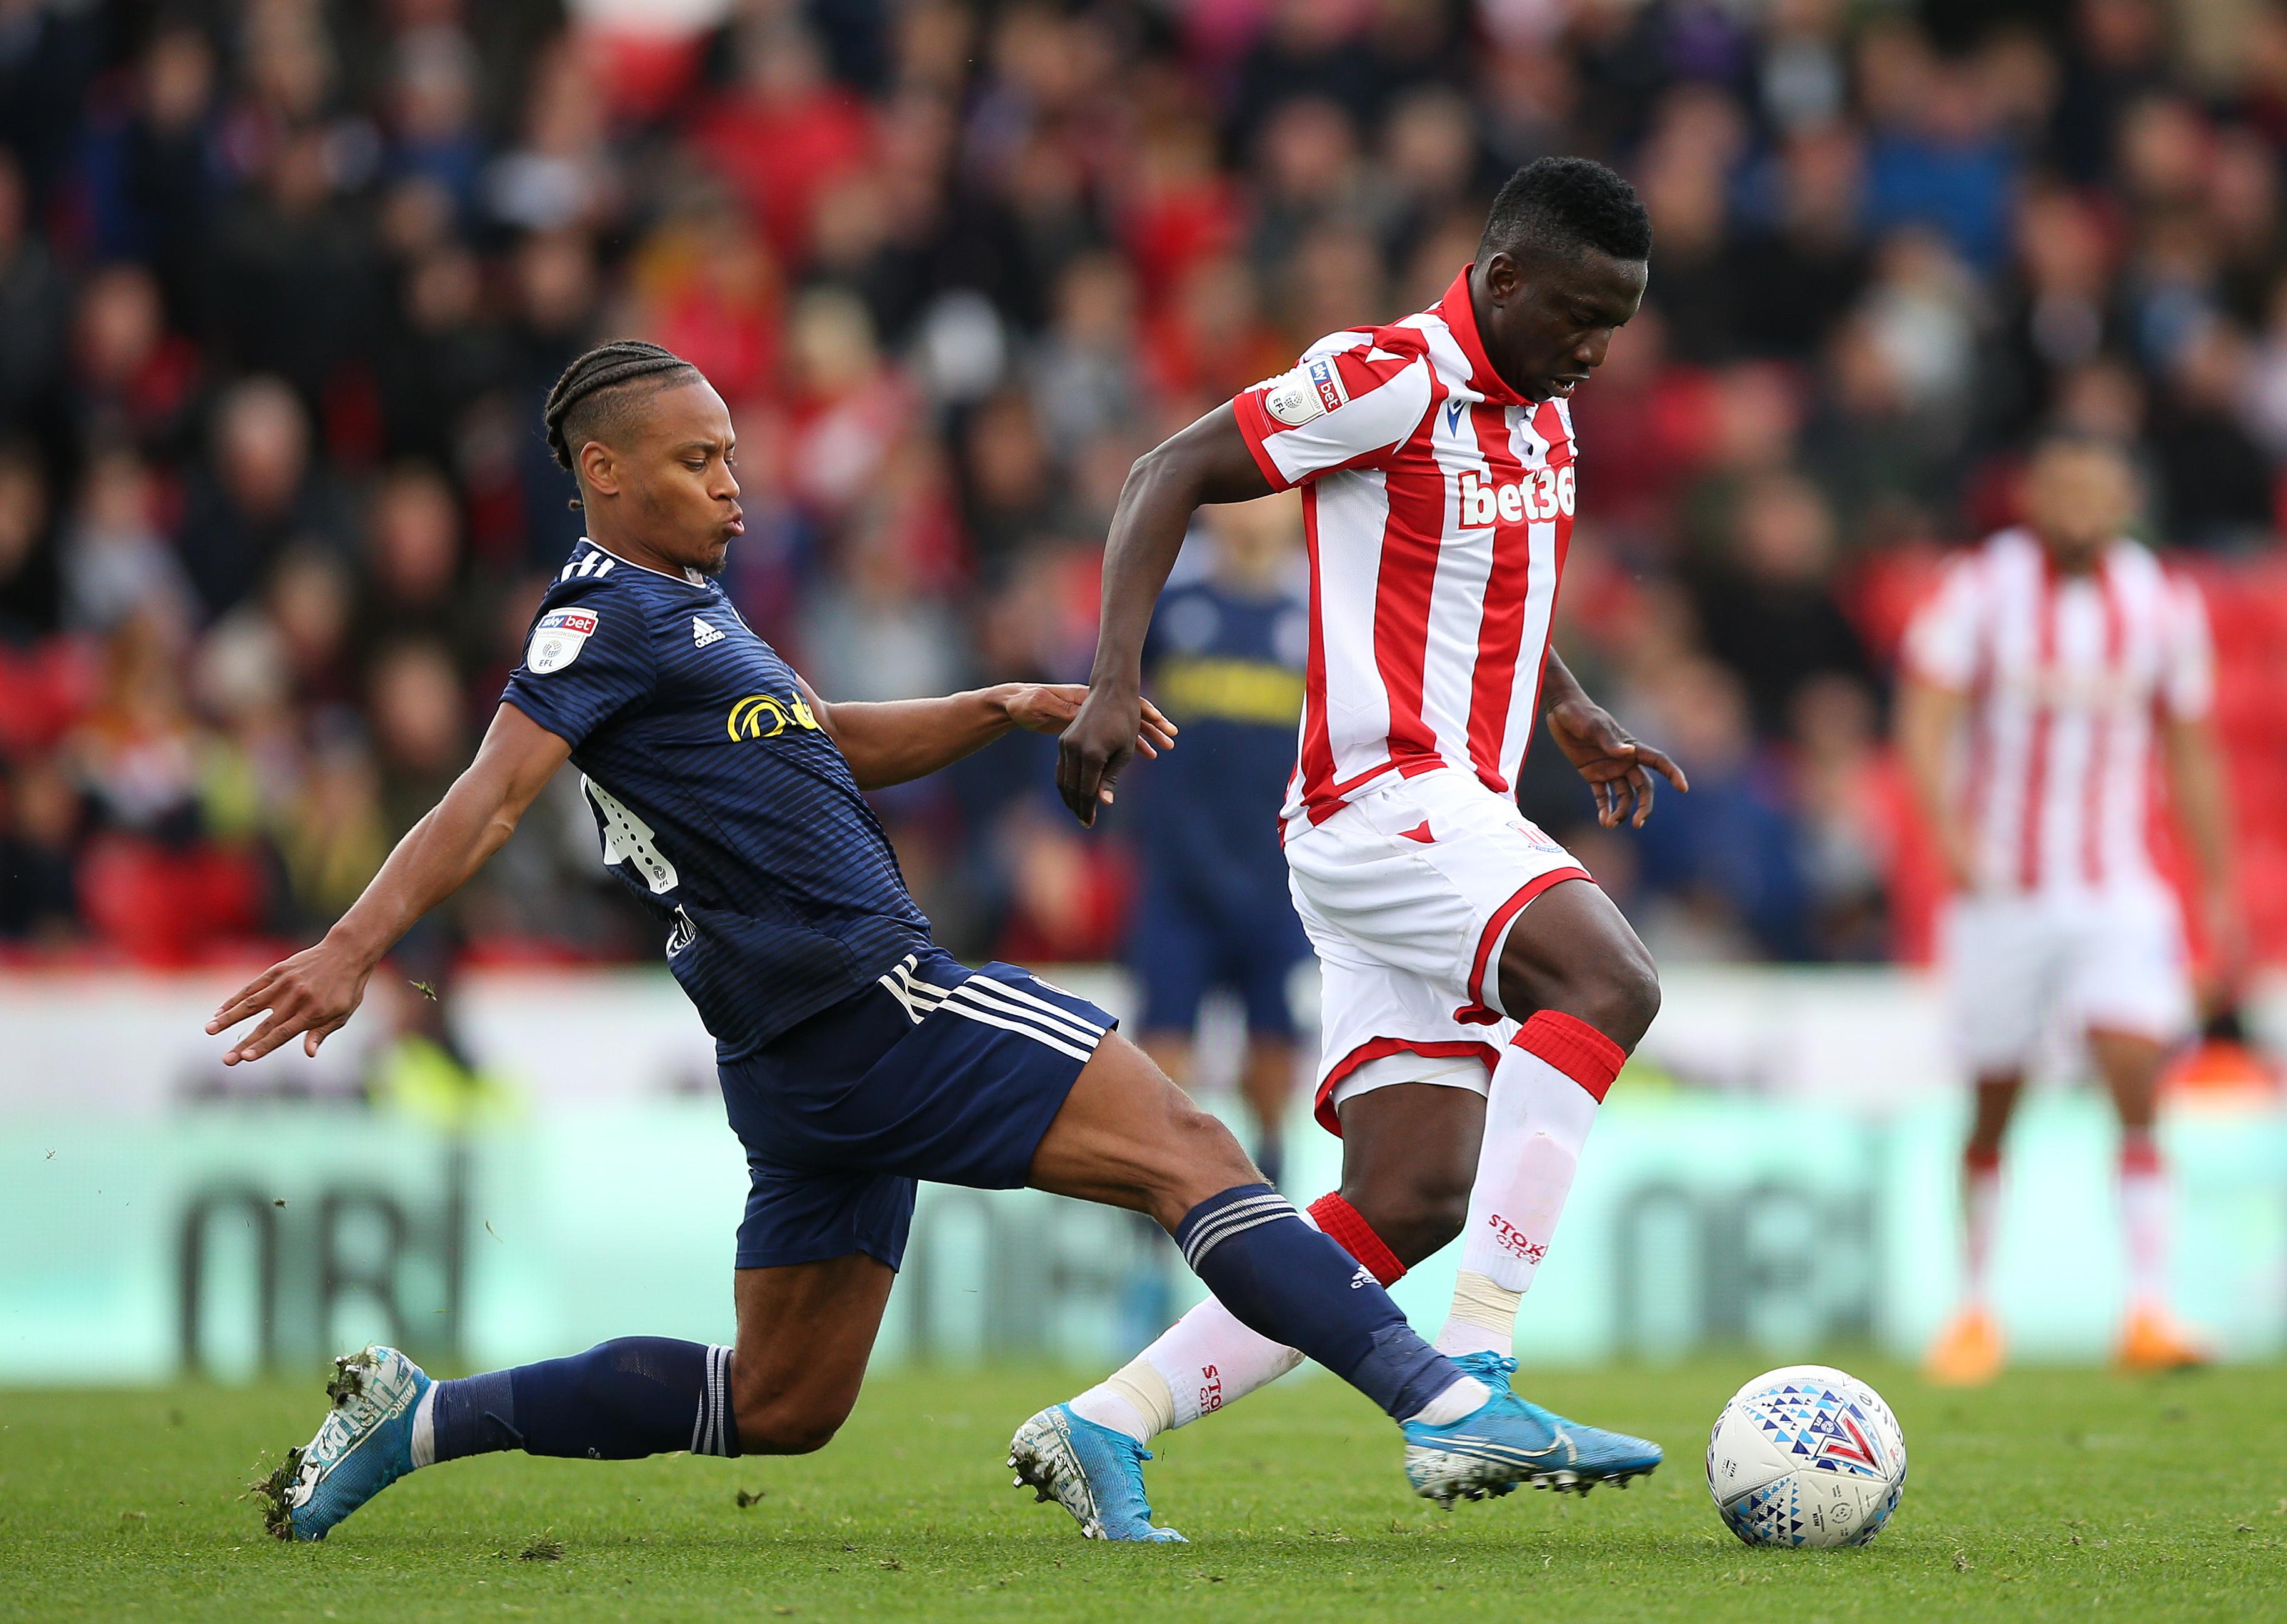 Stoke City v Fulham - Sky Bet Championship - bet365 Stadium